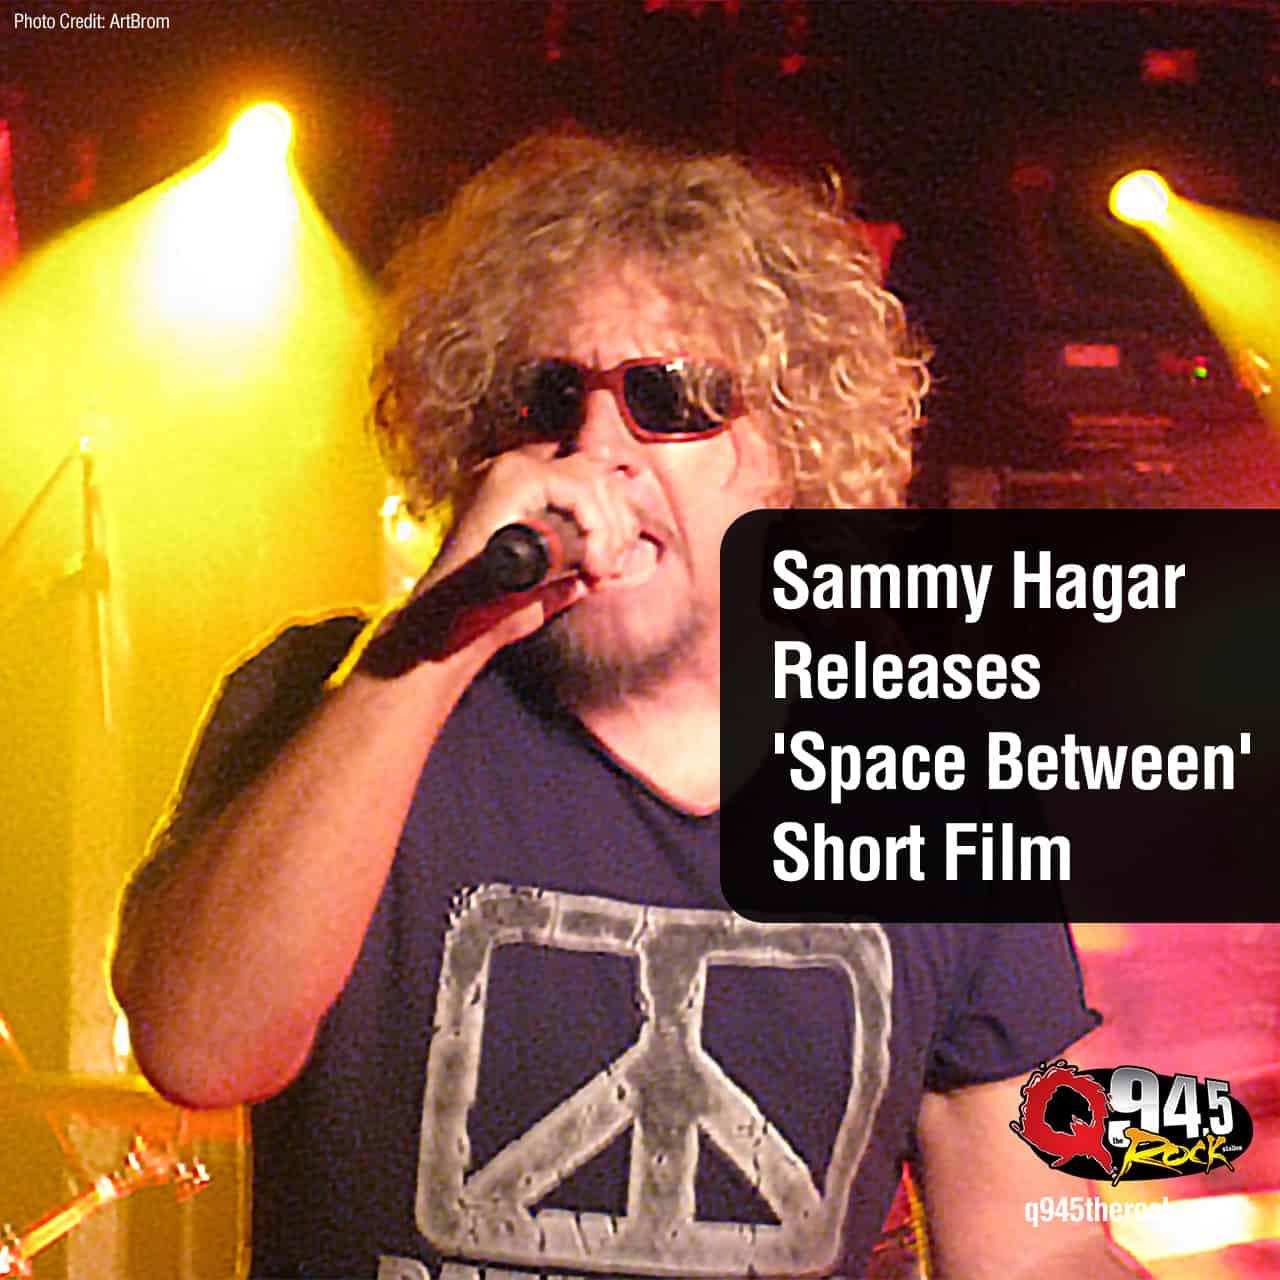 Sammy Hagar Releases 'Space Between' Short Film